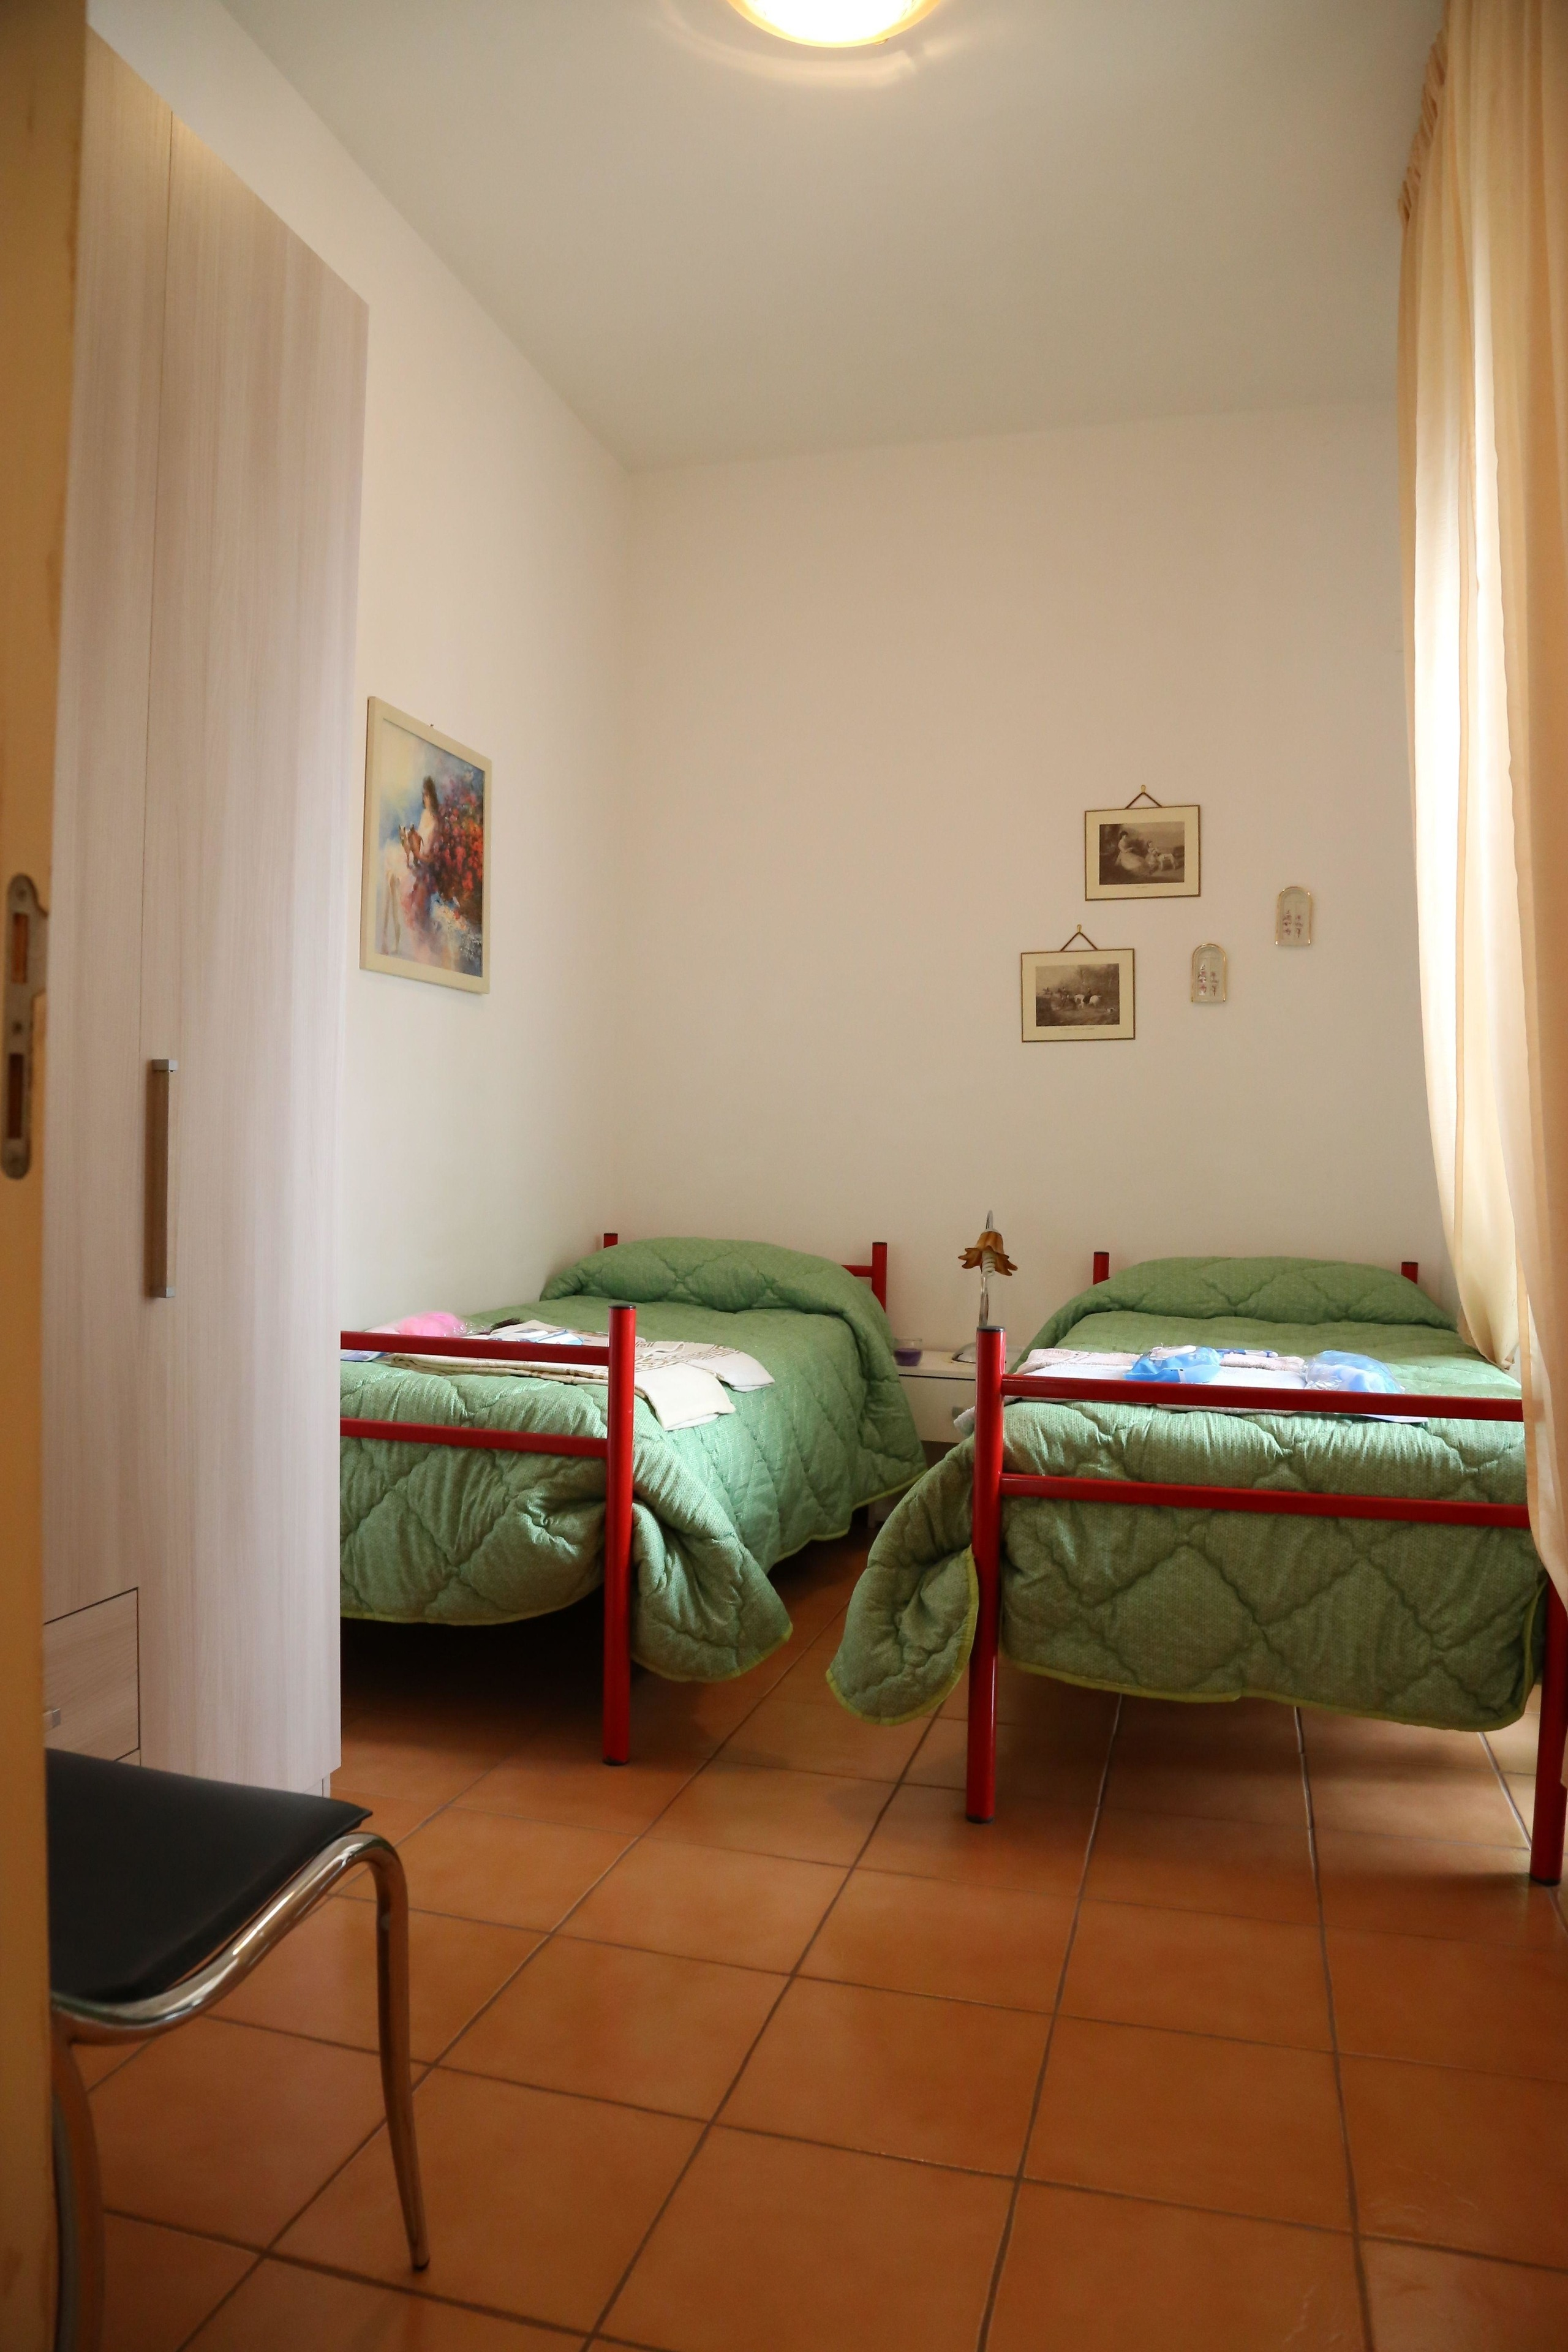 Ferienhaus LA CASA DEI PARGOLI (2516888), Matera, Matera, Basilikata, Italien, Bild 16